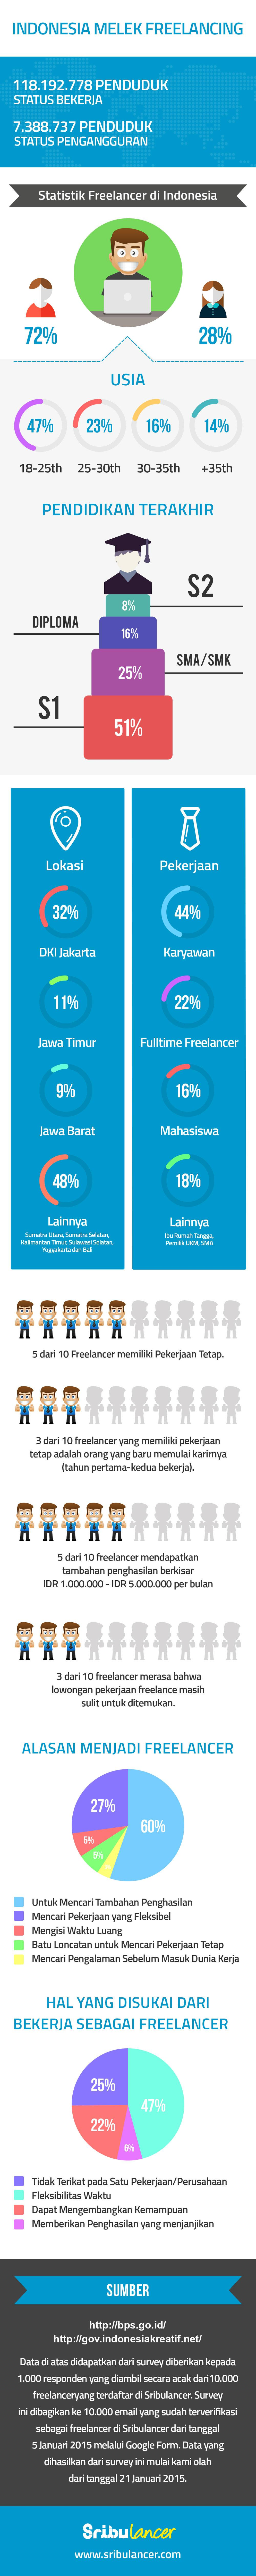 infographics_ID(1)